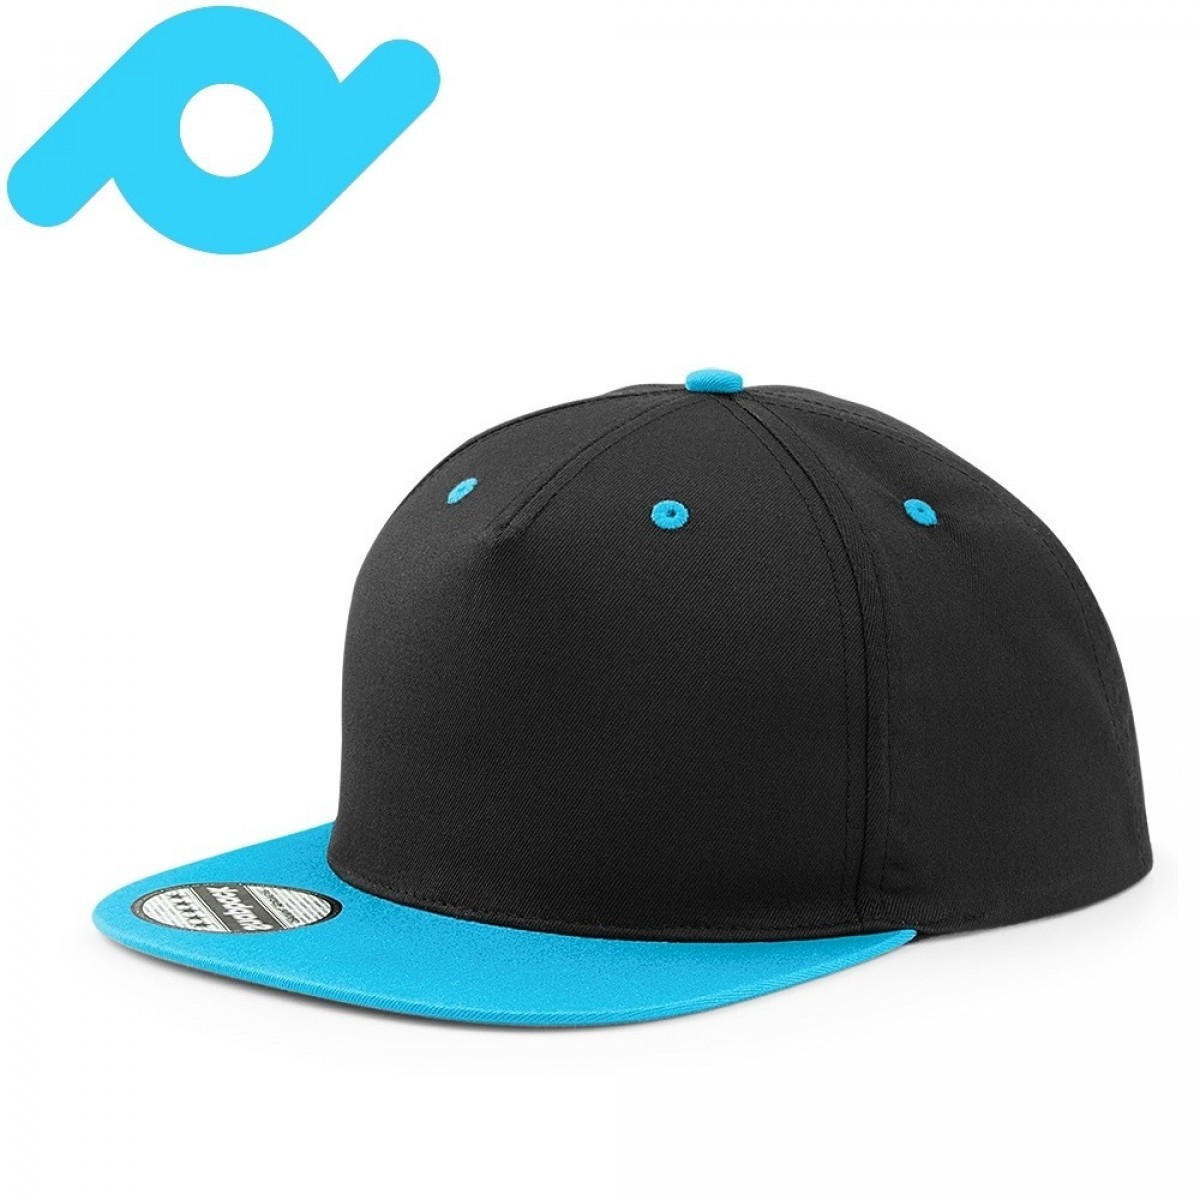 Senvi Snapback met Platte Klep Zwart/Blauw (One size fits all)